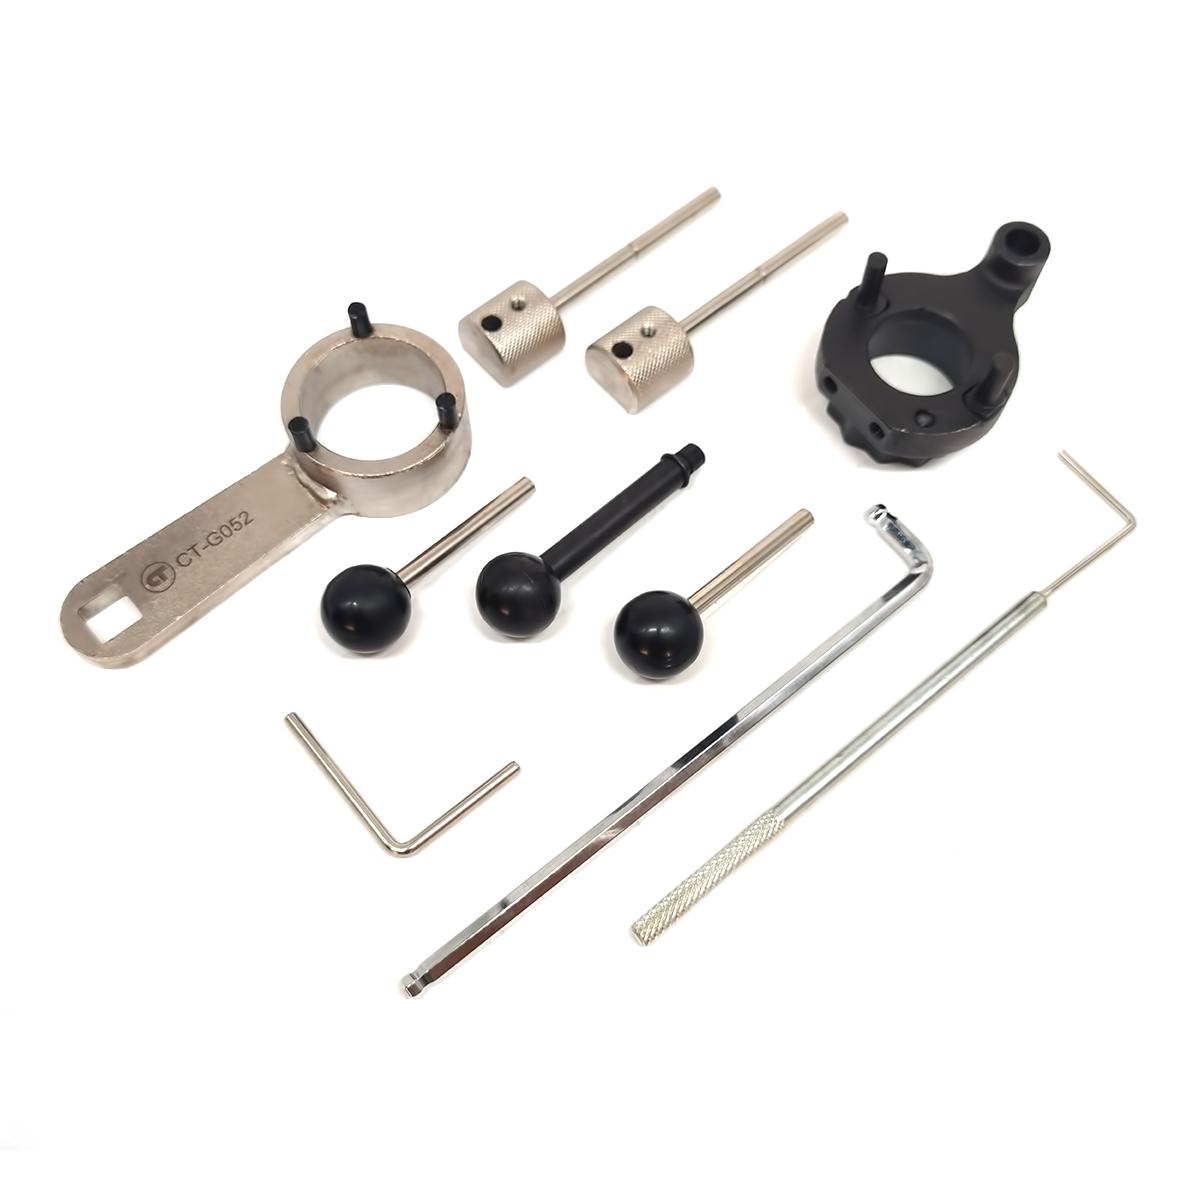 Набор для ремонта ГРМ VAG 1.6 - 2.0 TDI CR Car-Tool CT-G052